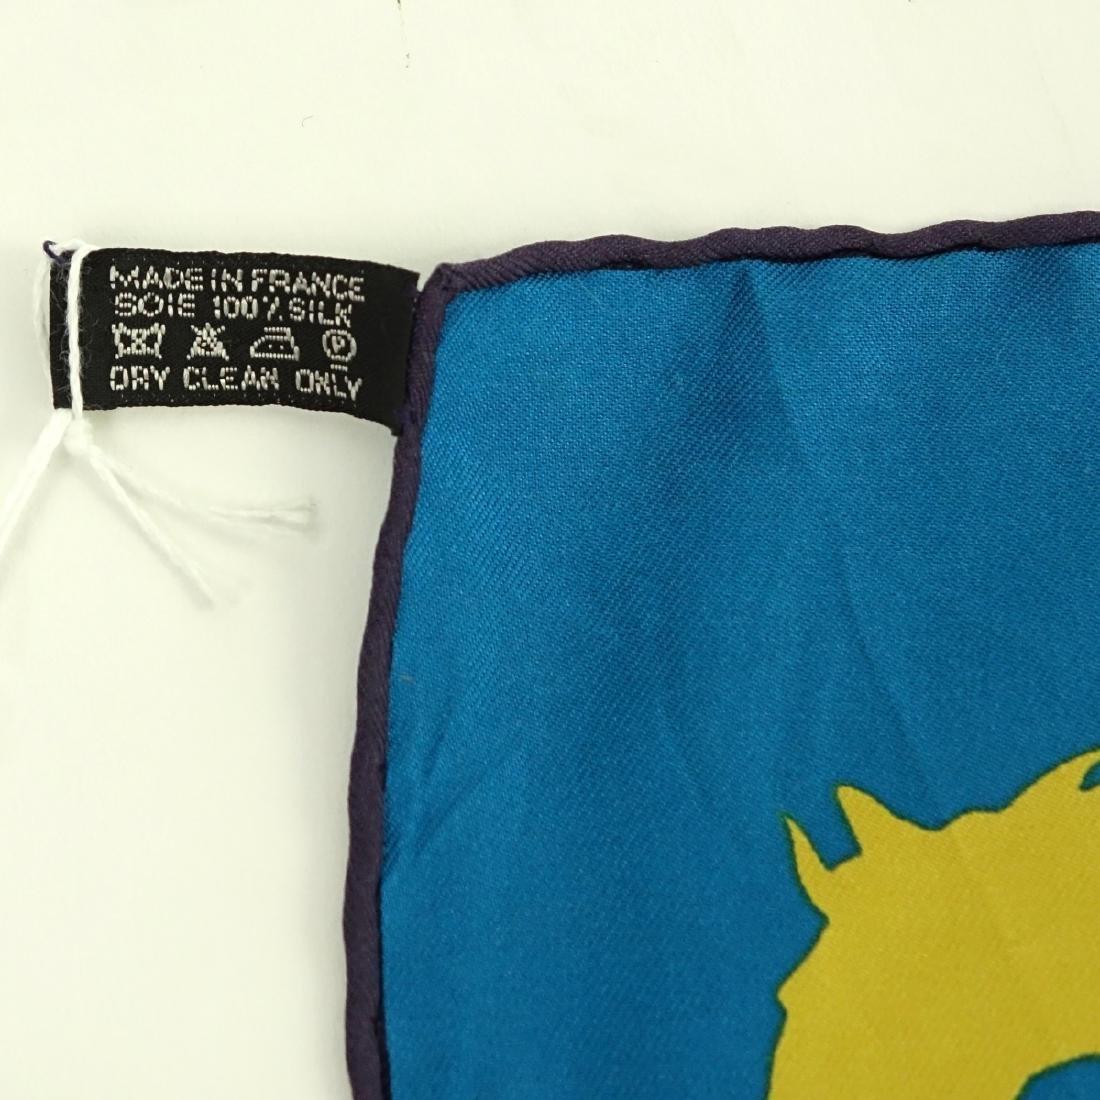 Hermes Ex Libris en Camouflage Twill Silk Scarf - 3